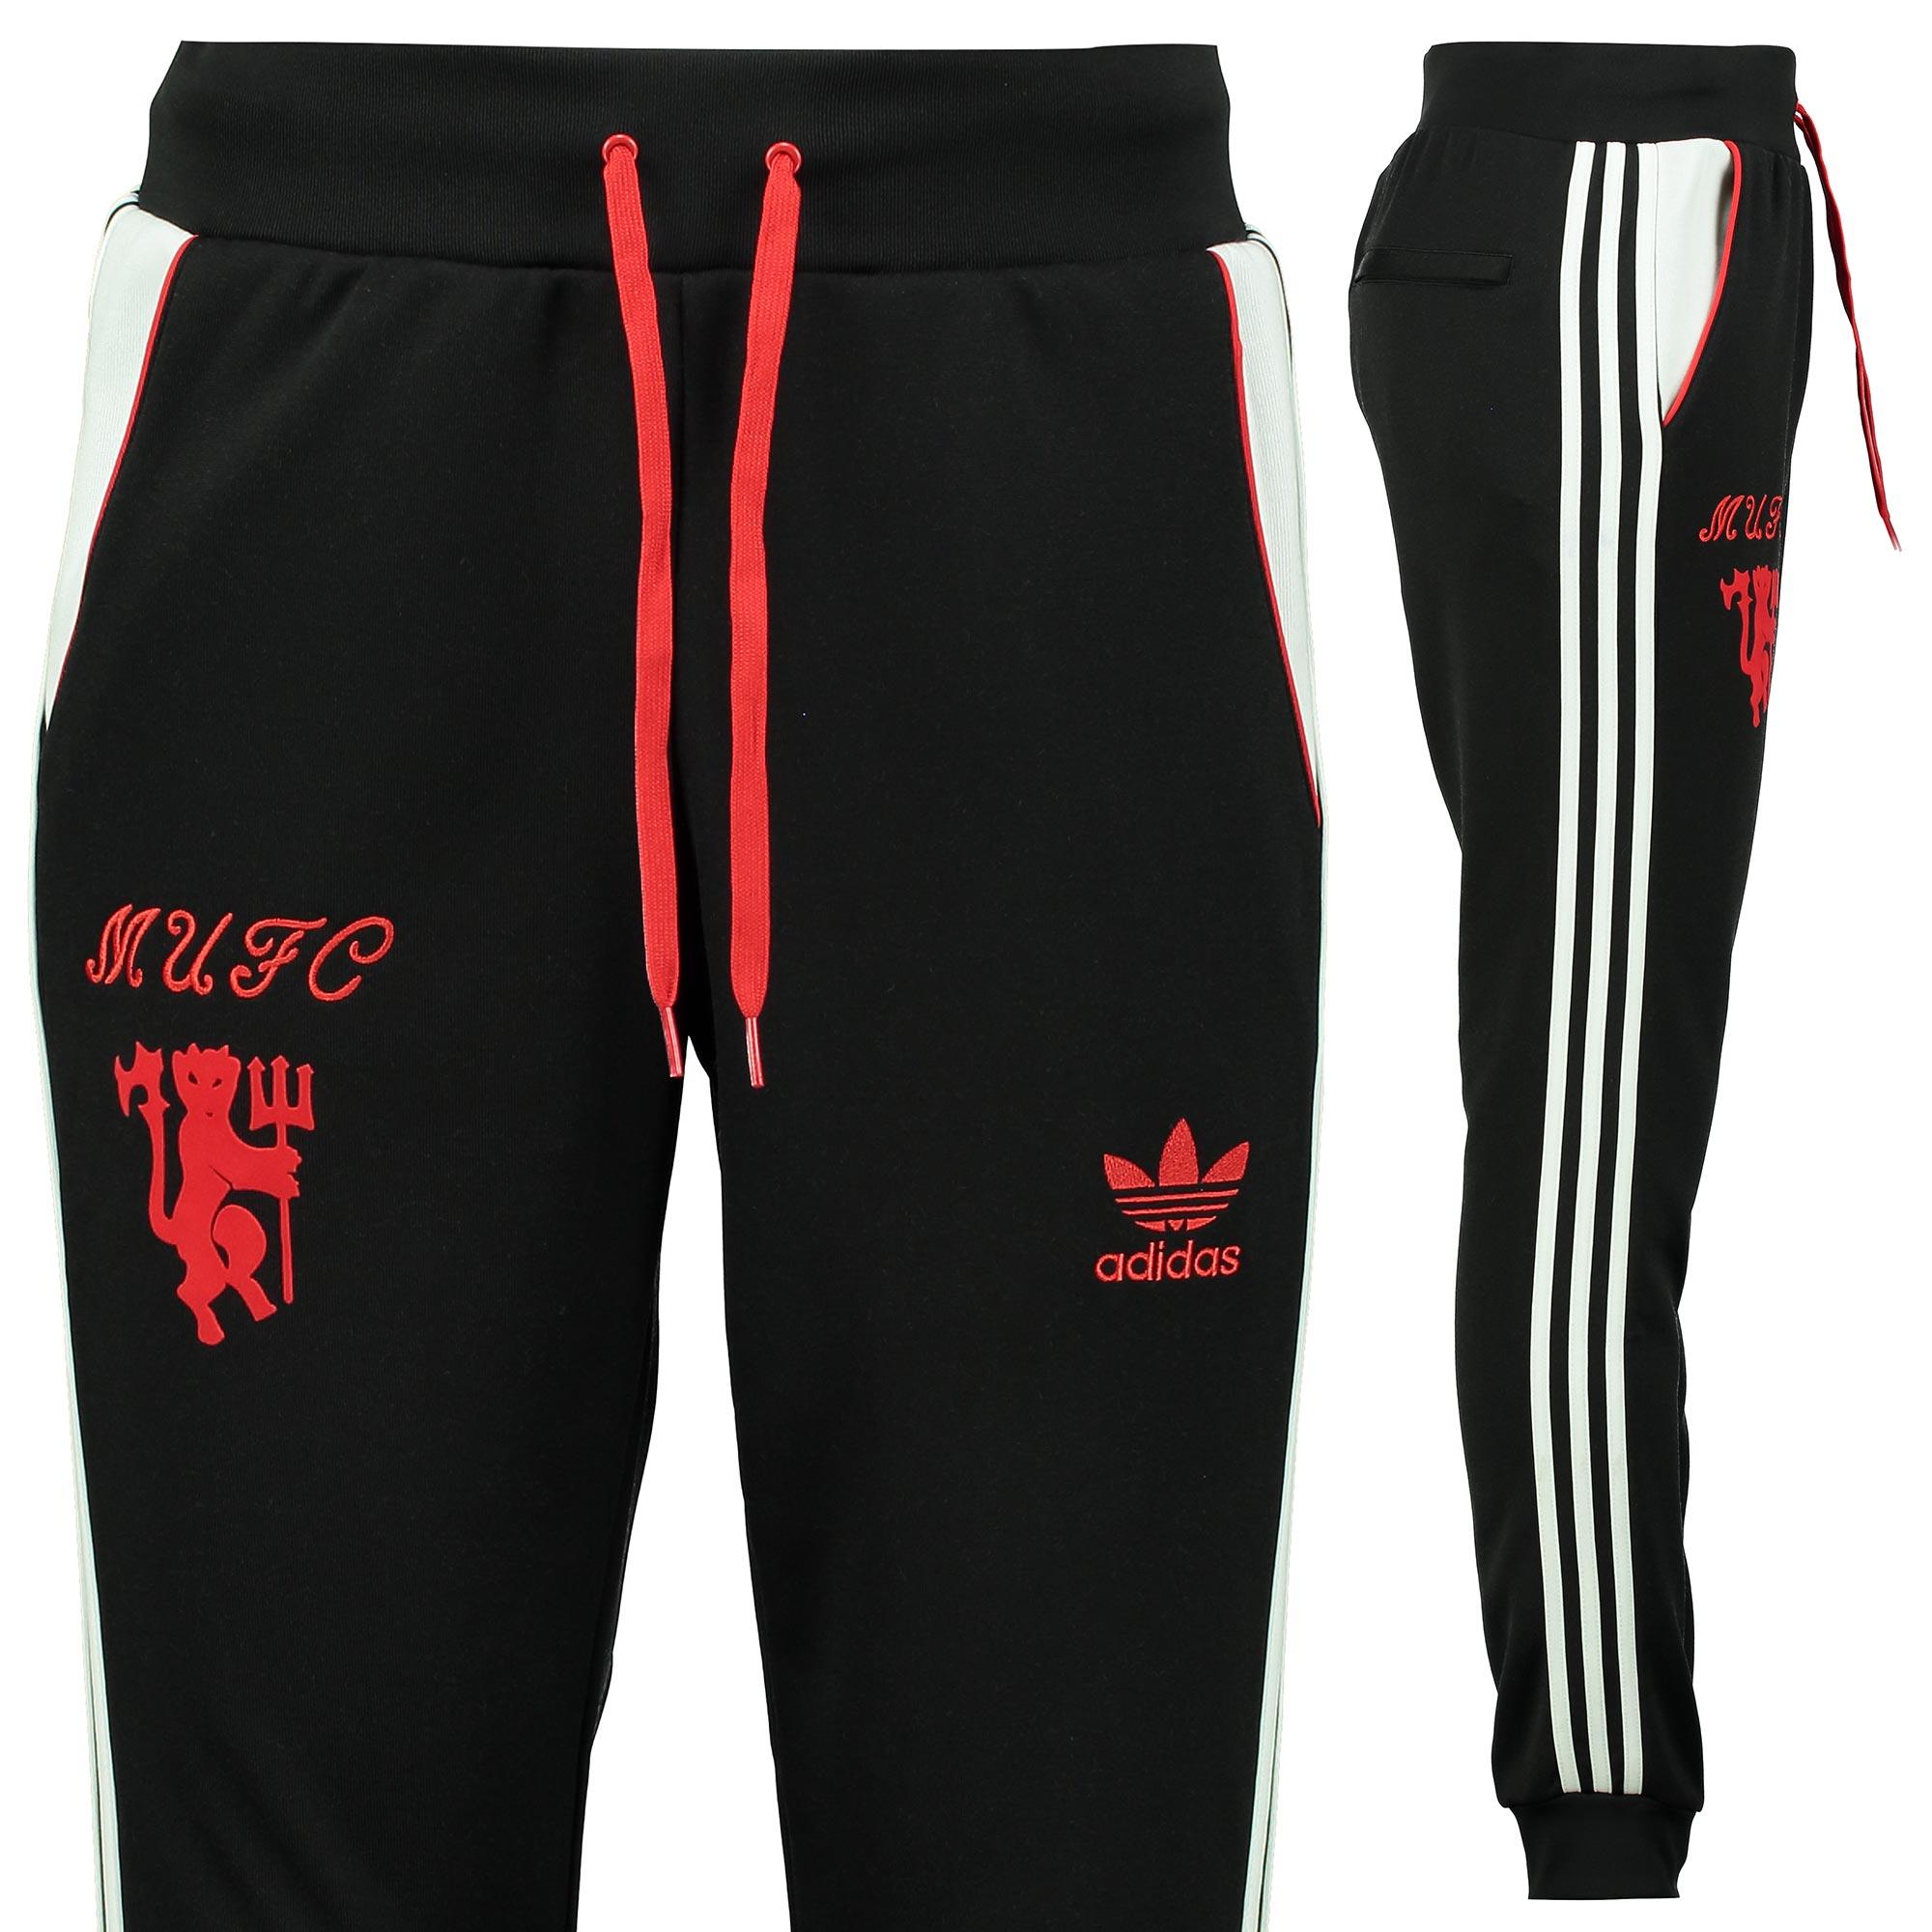 Manchester United Originals Track Pant - Black